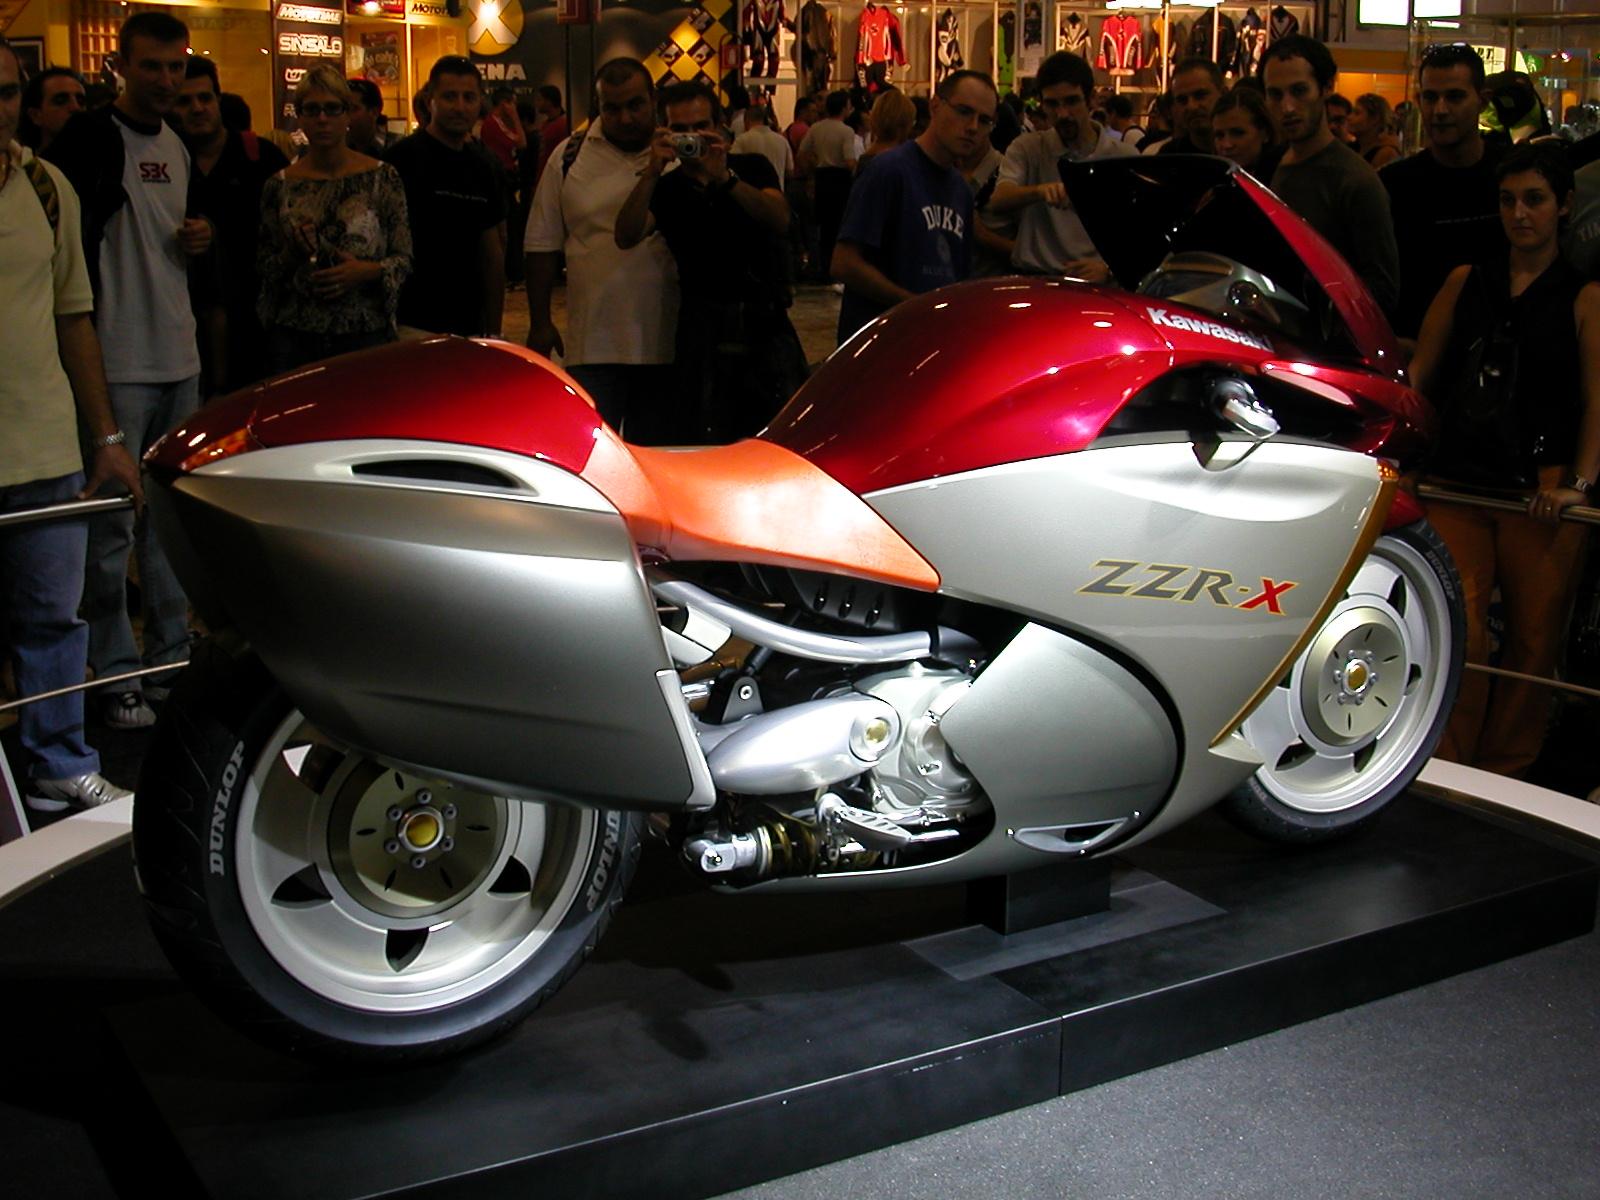 Kawasaki Future Bike